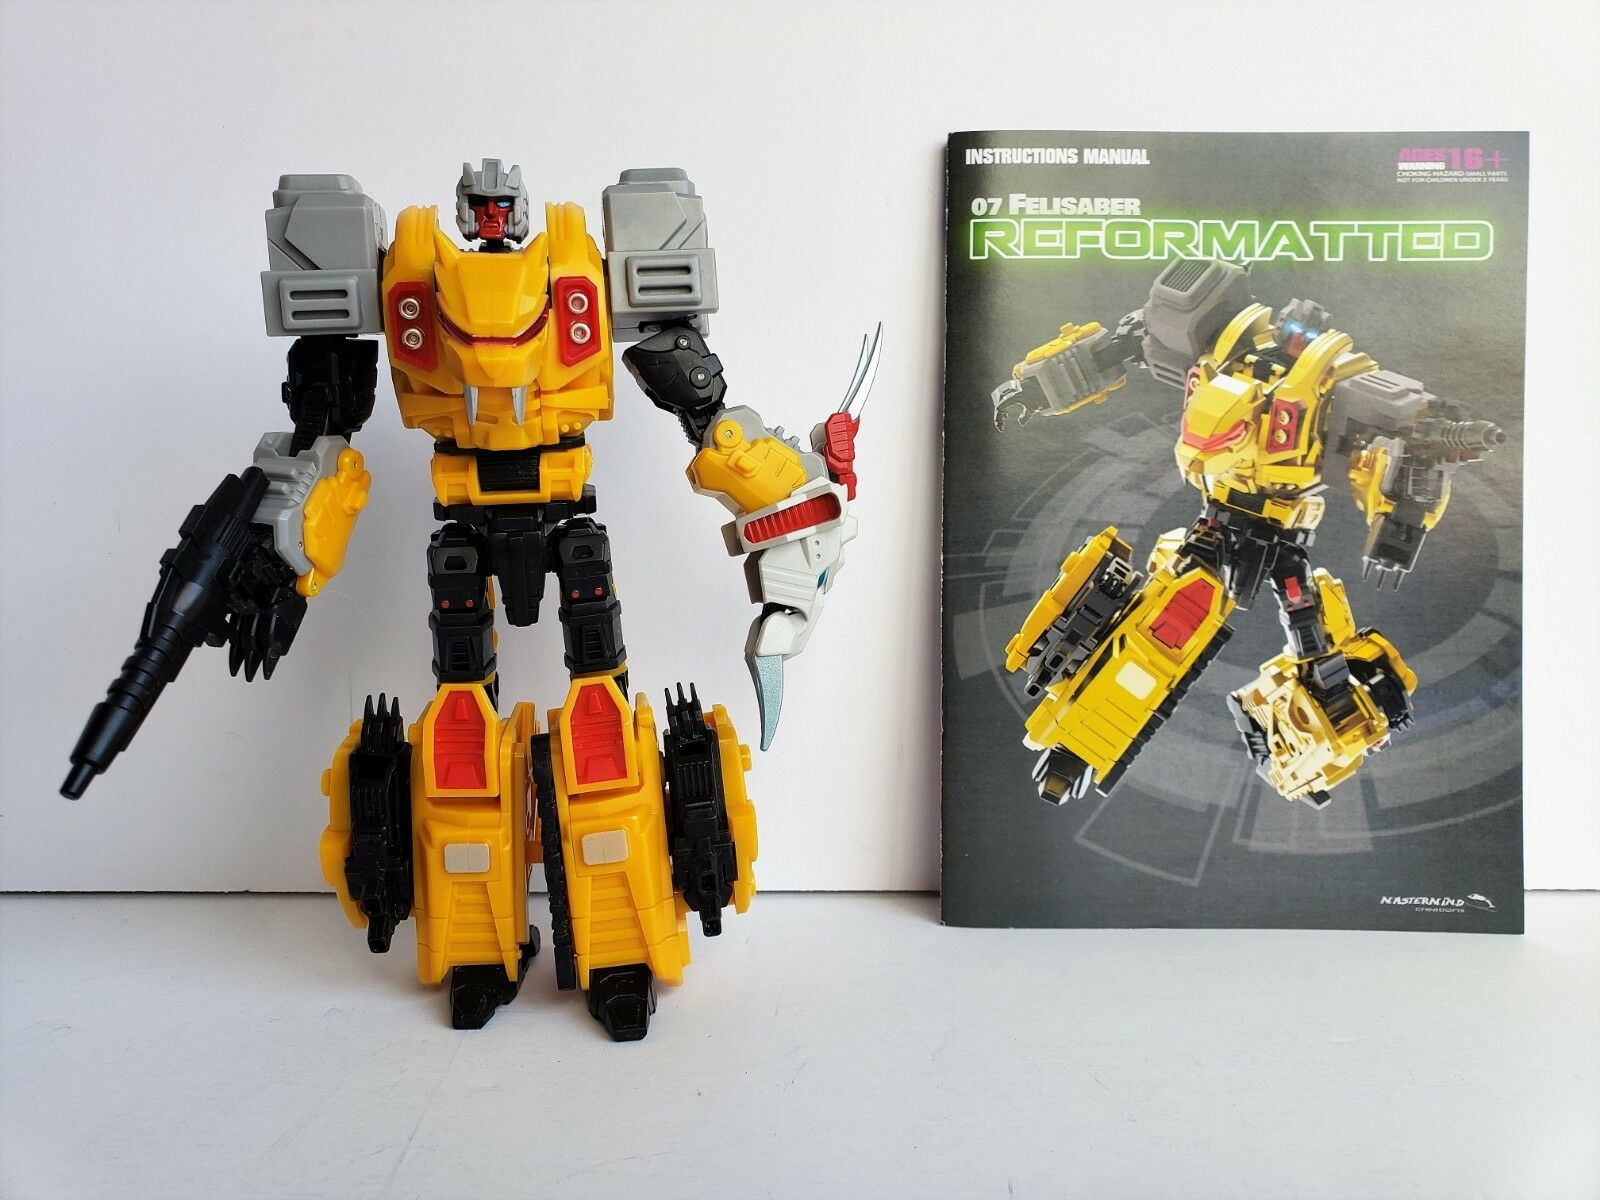 Transformers Mastermind Creations Reformatted  07 FELISABER (CATILLA) COMPLETE